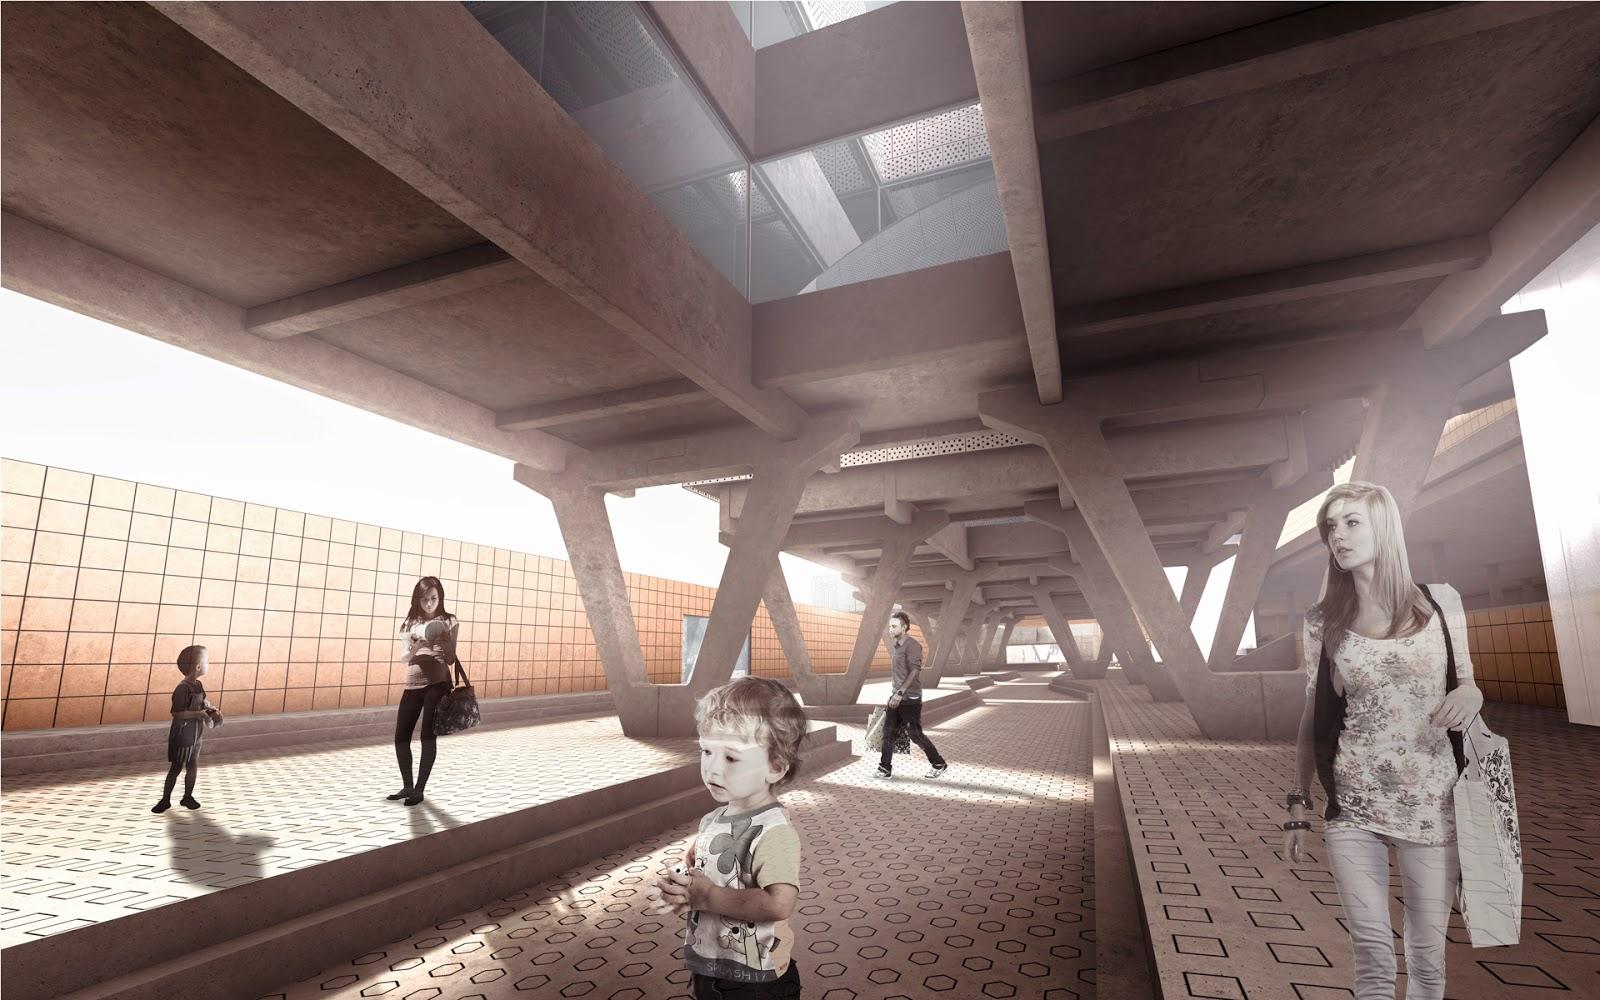 RENDERS 3D PFC - Fotomontaje Interior 3d para el PFC UAH de Naama de Miguel de Pablo - ETSAM UEM UCJC ESAYT USPCEU USP CEU IE UAX UAH UPM ETSA